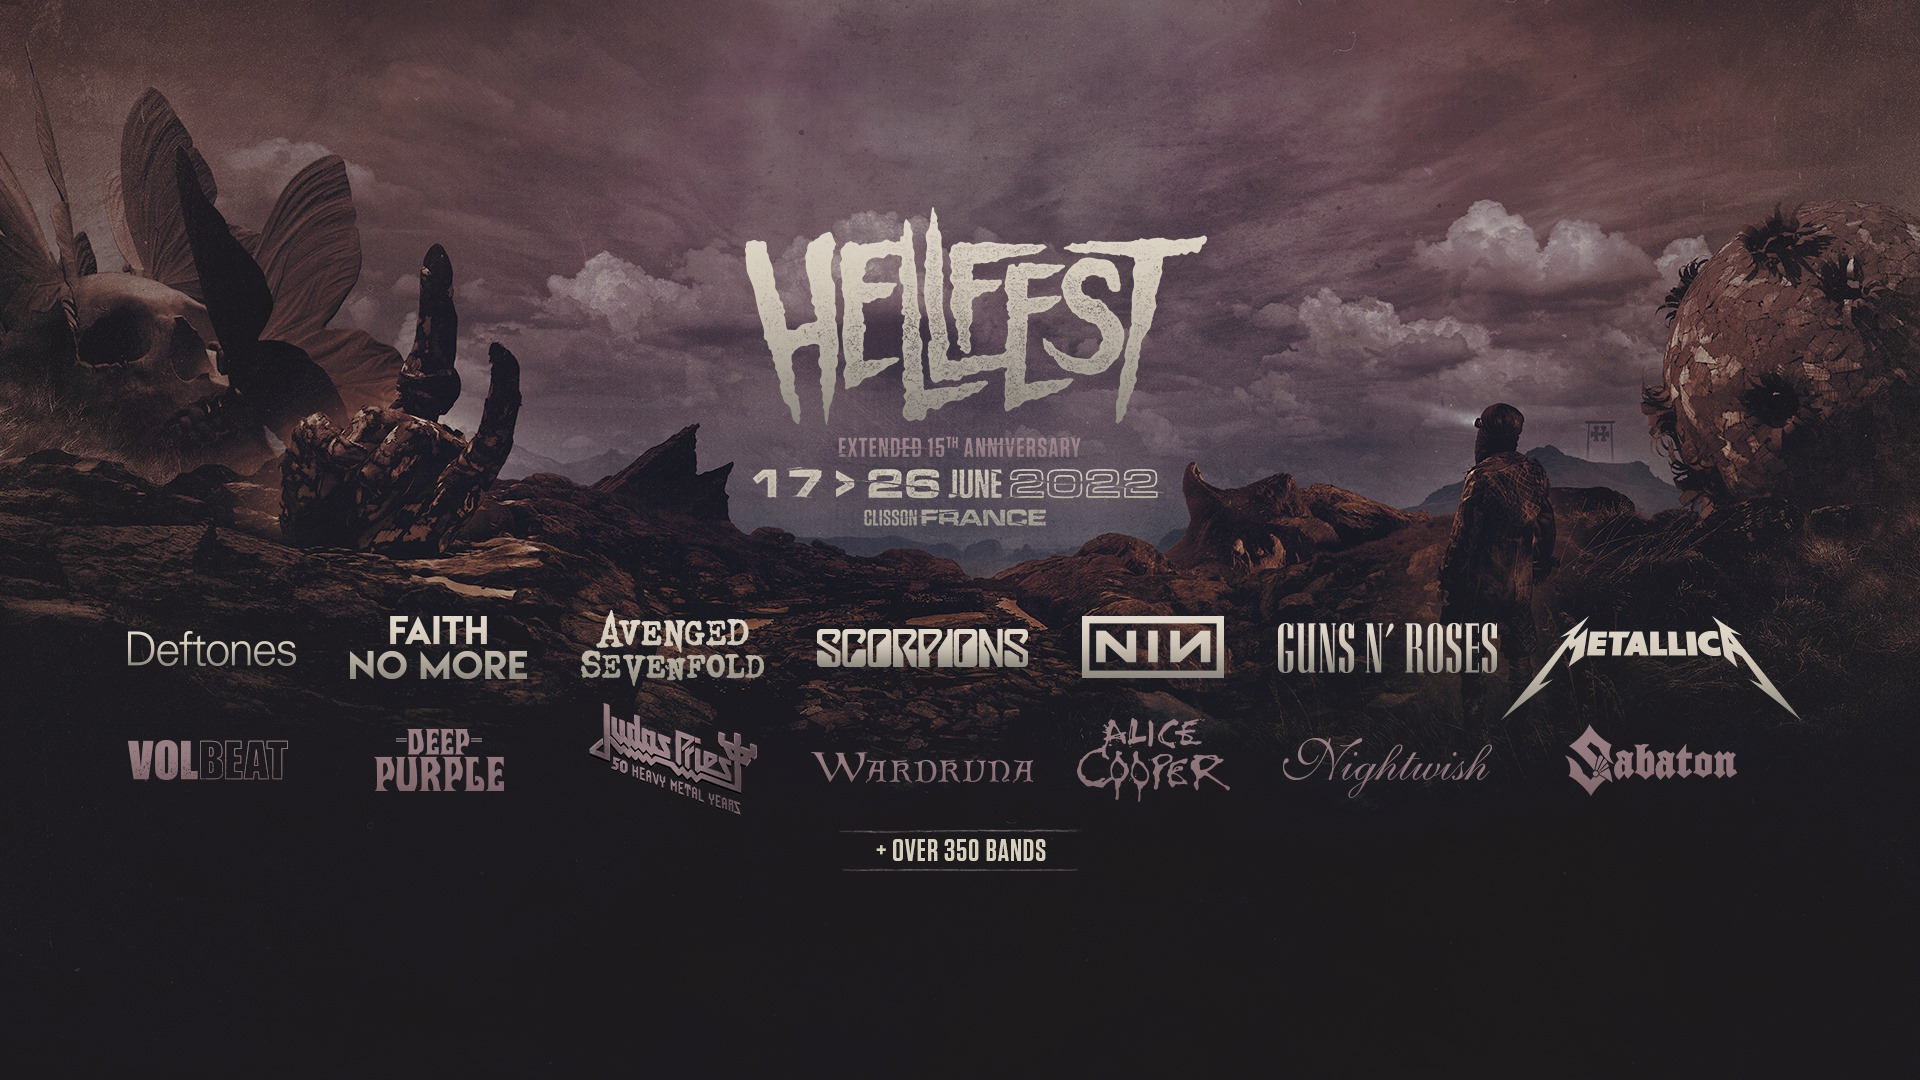 hellfest 2022 pic 3